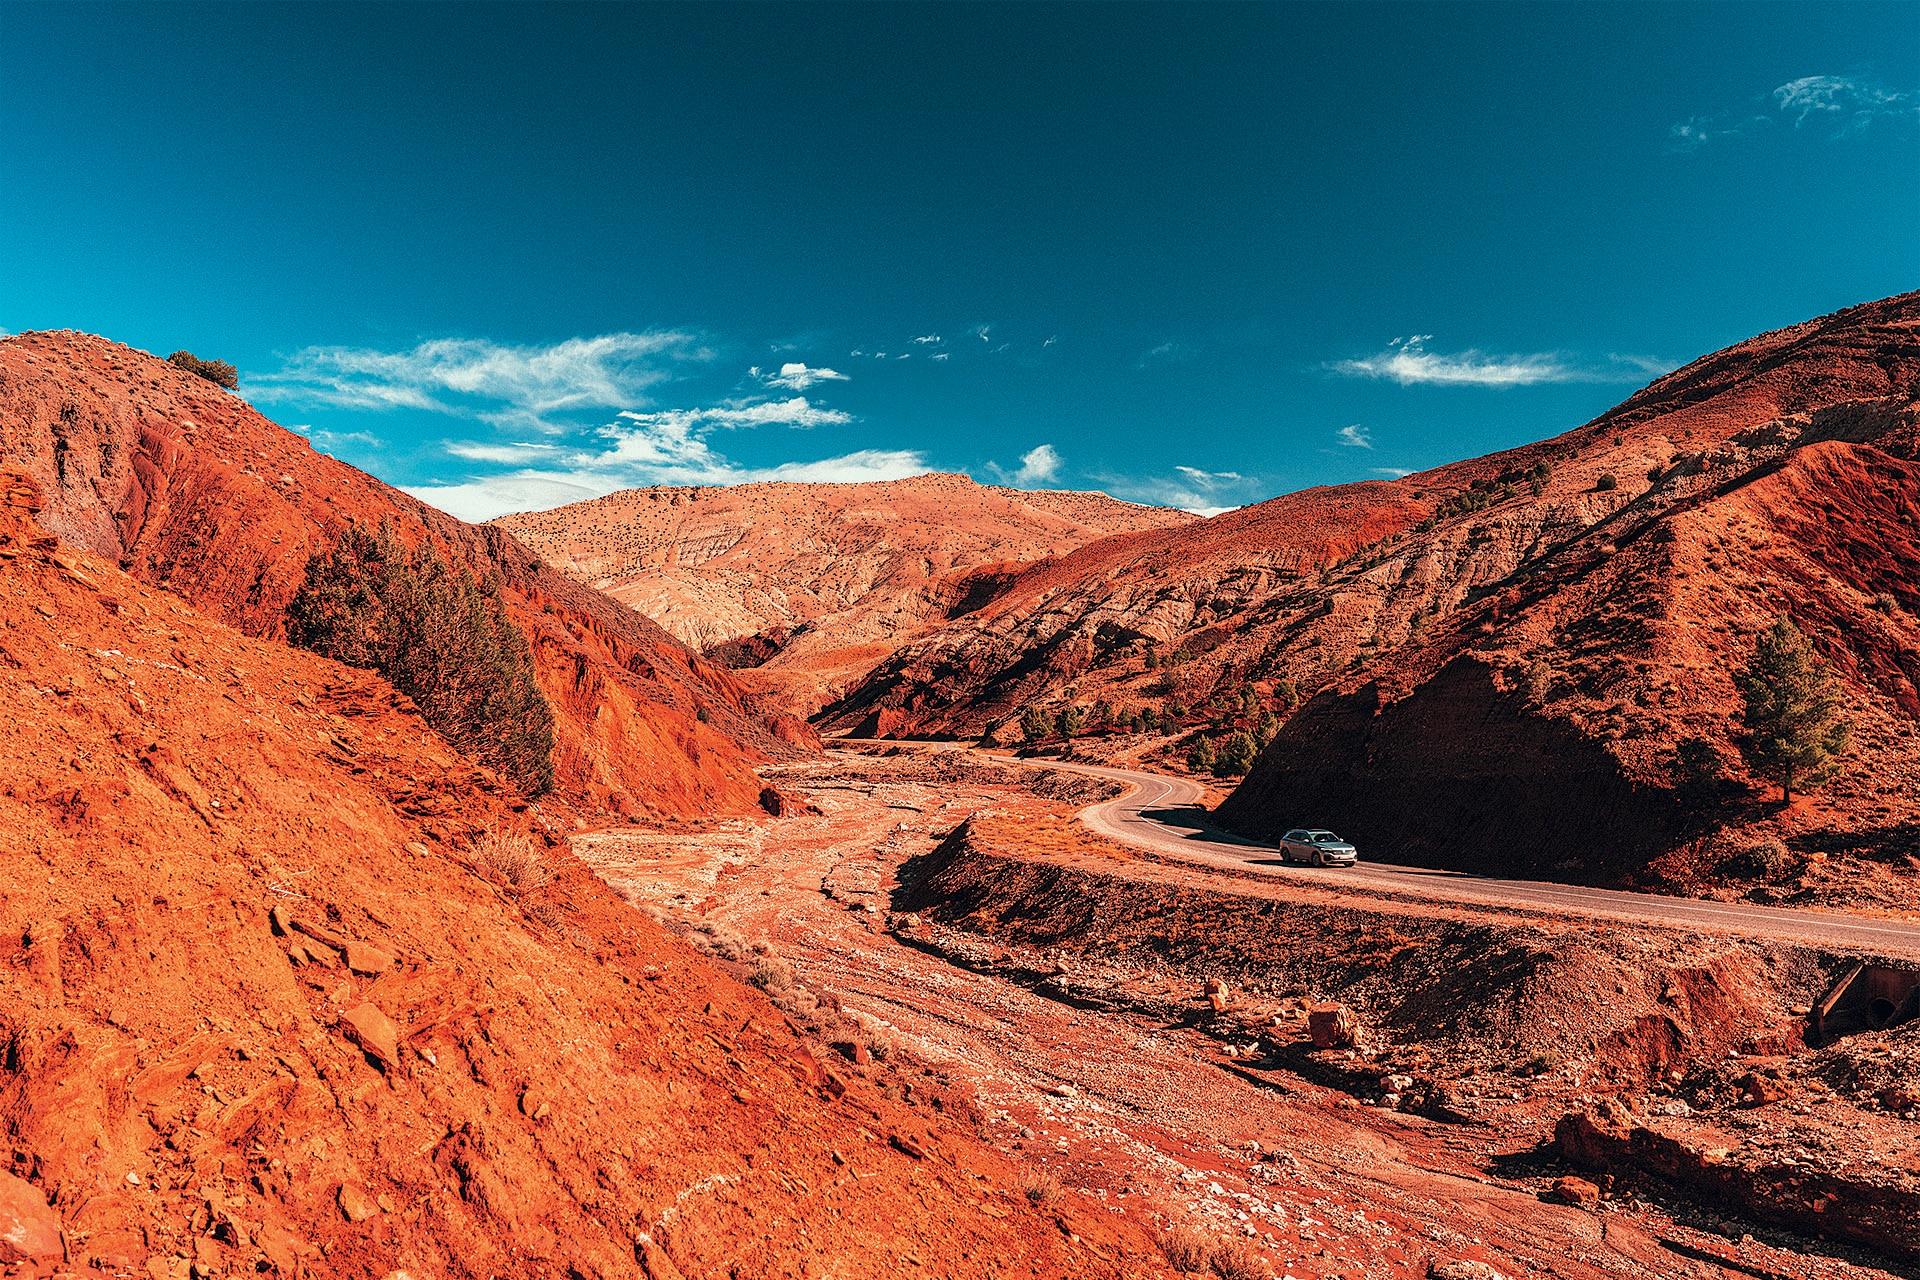 Can The 2019 Volkswagen Touareg Handle A 1300km Trek Across Morocco?